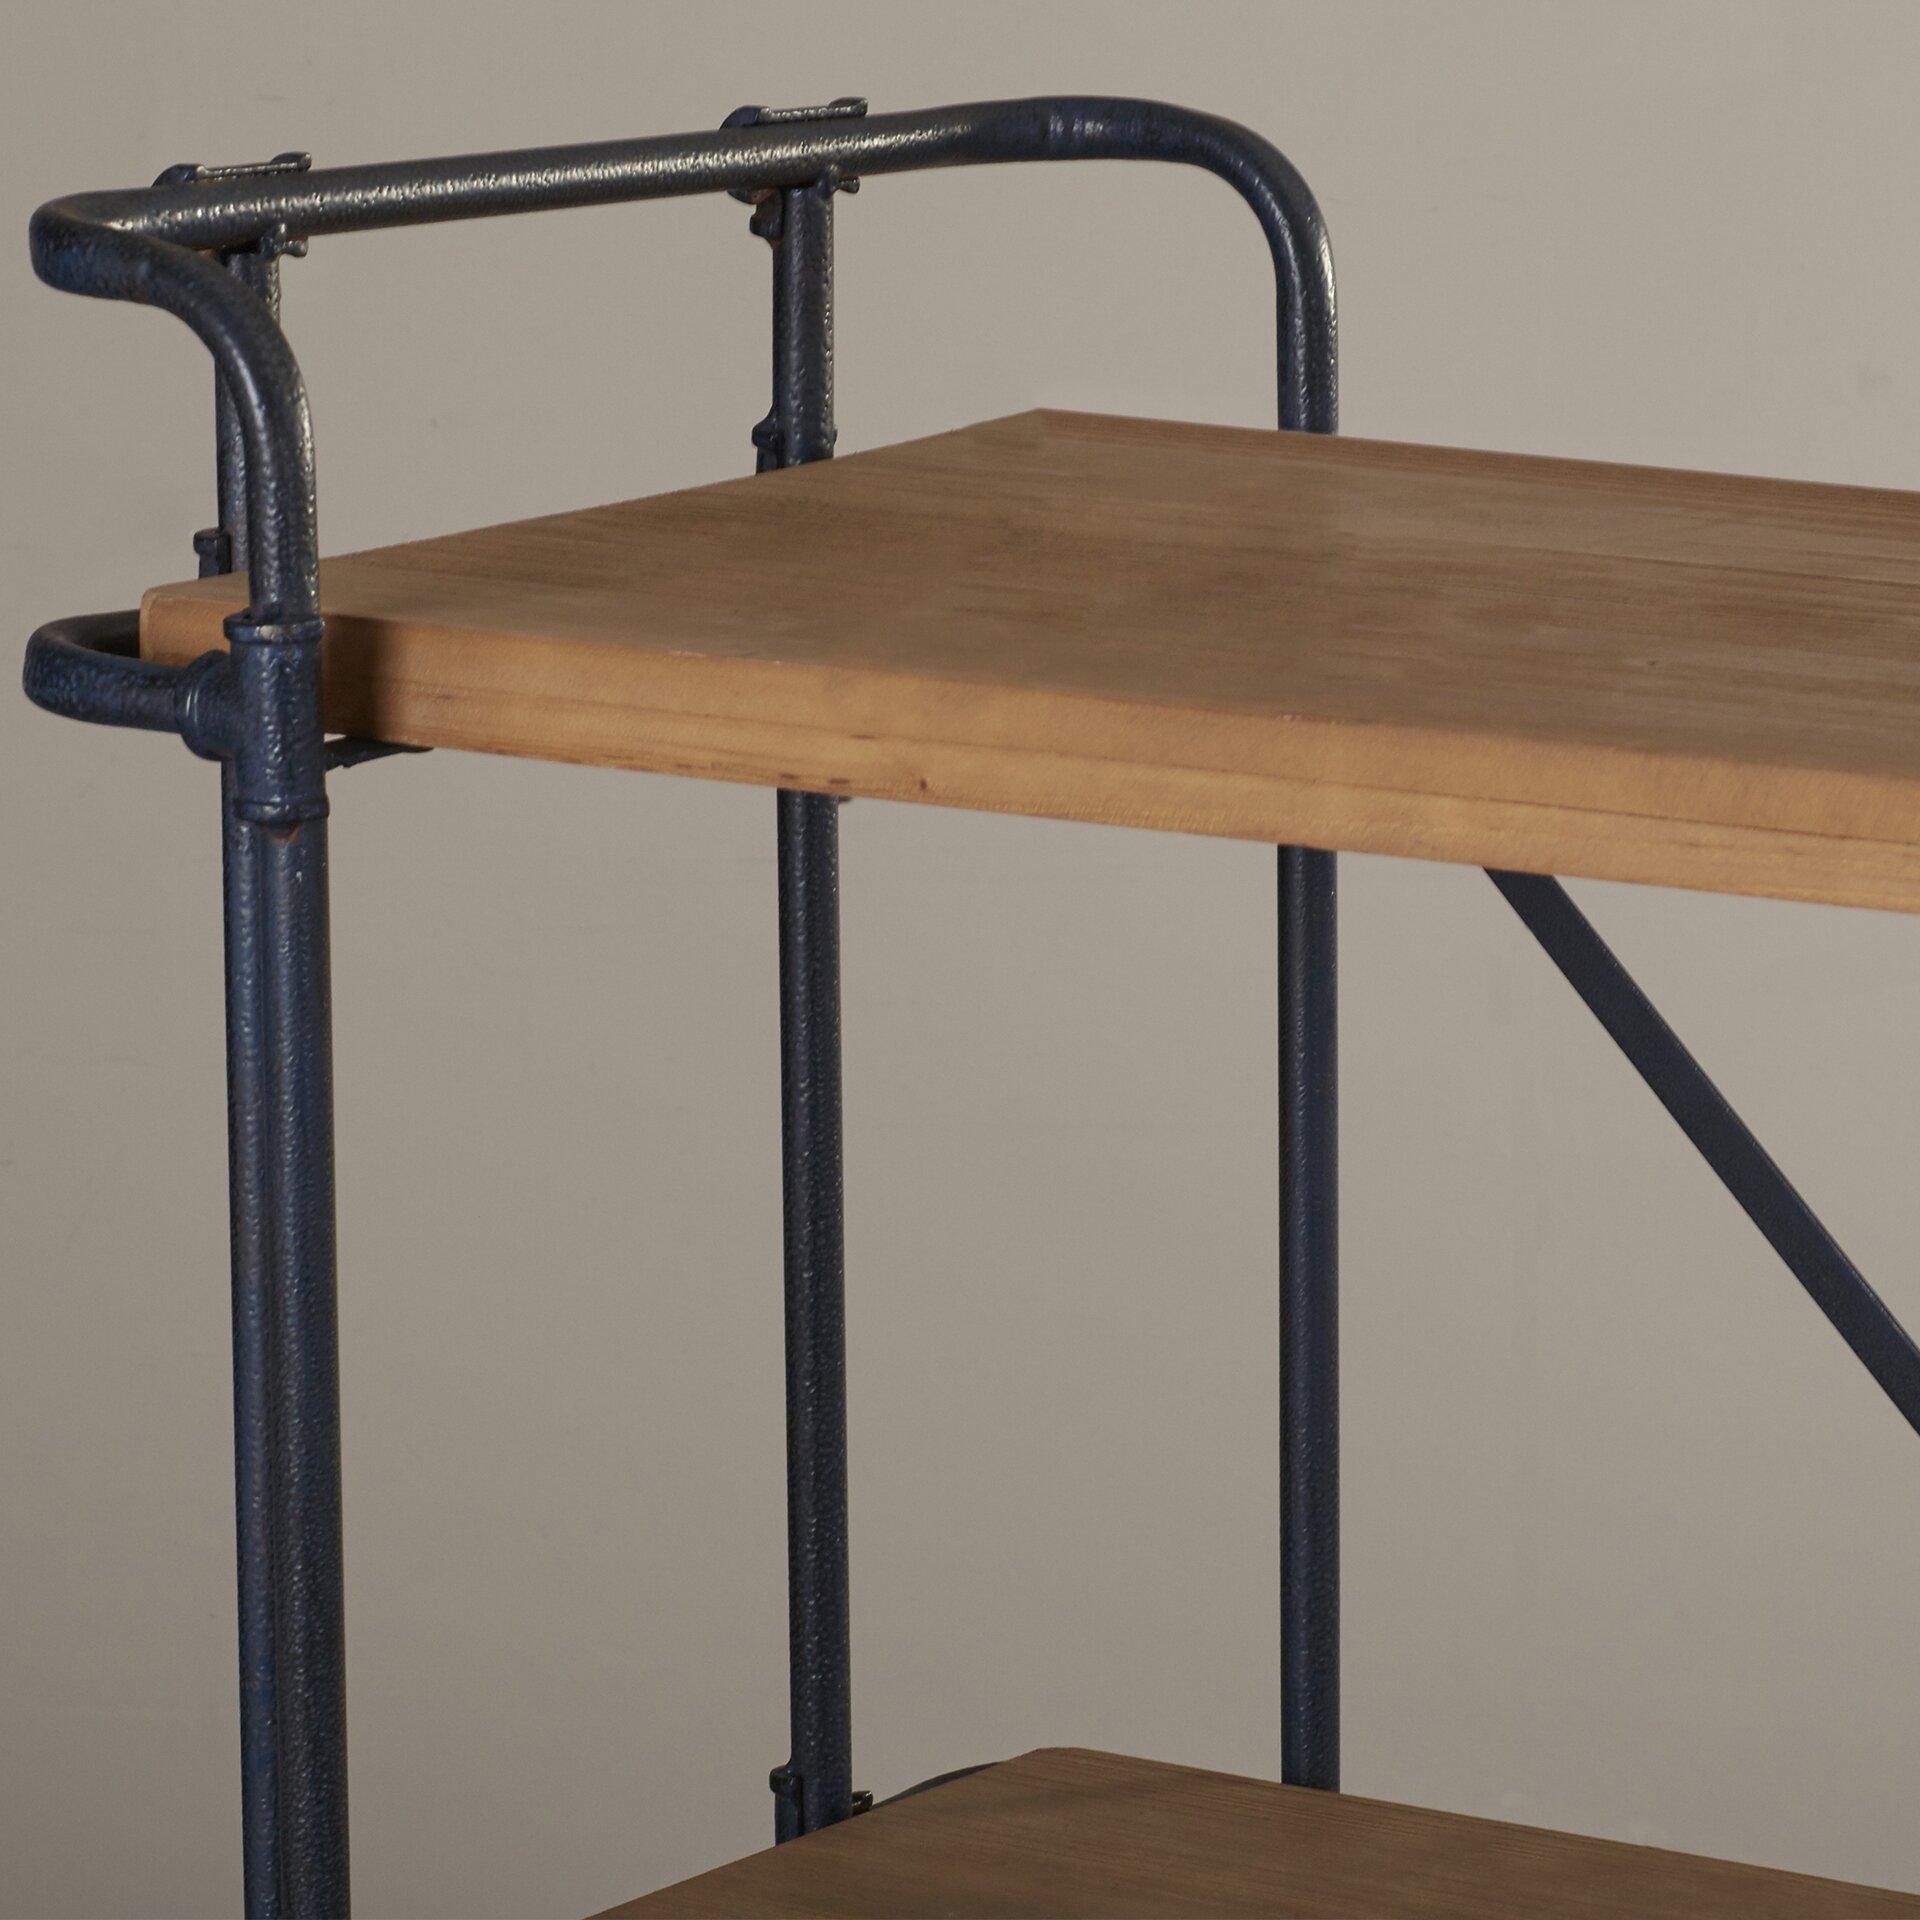 trent austin design 67 etagere bookcase reviews wayfair. Black Bedroom Furniture Sets. Home Design Ideas